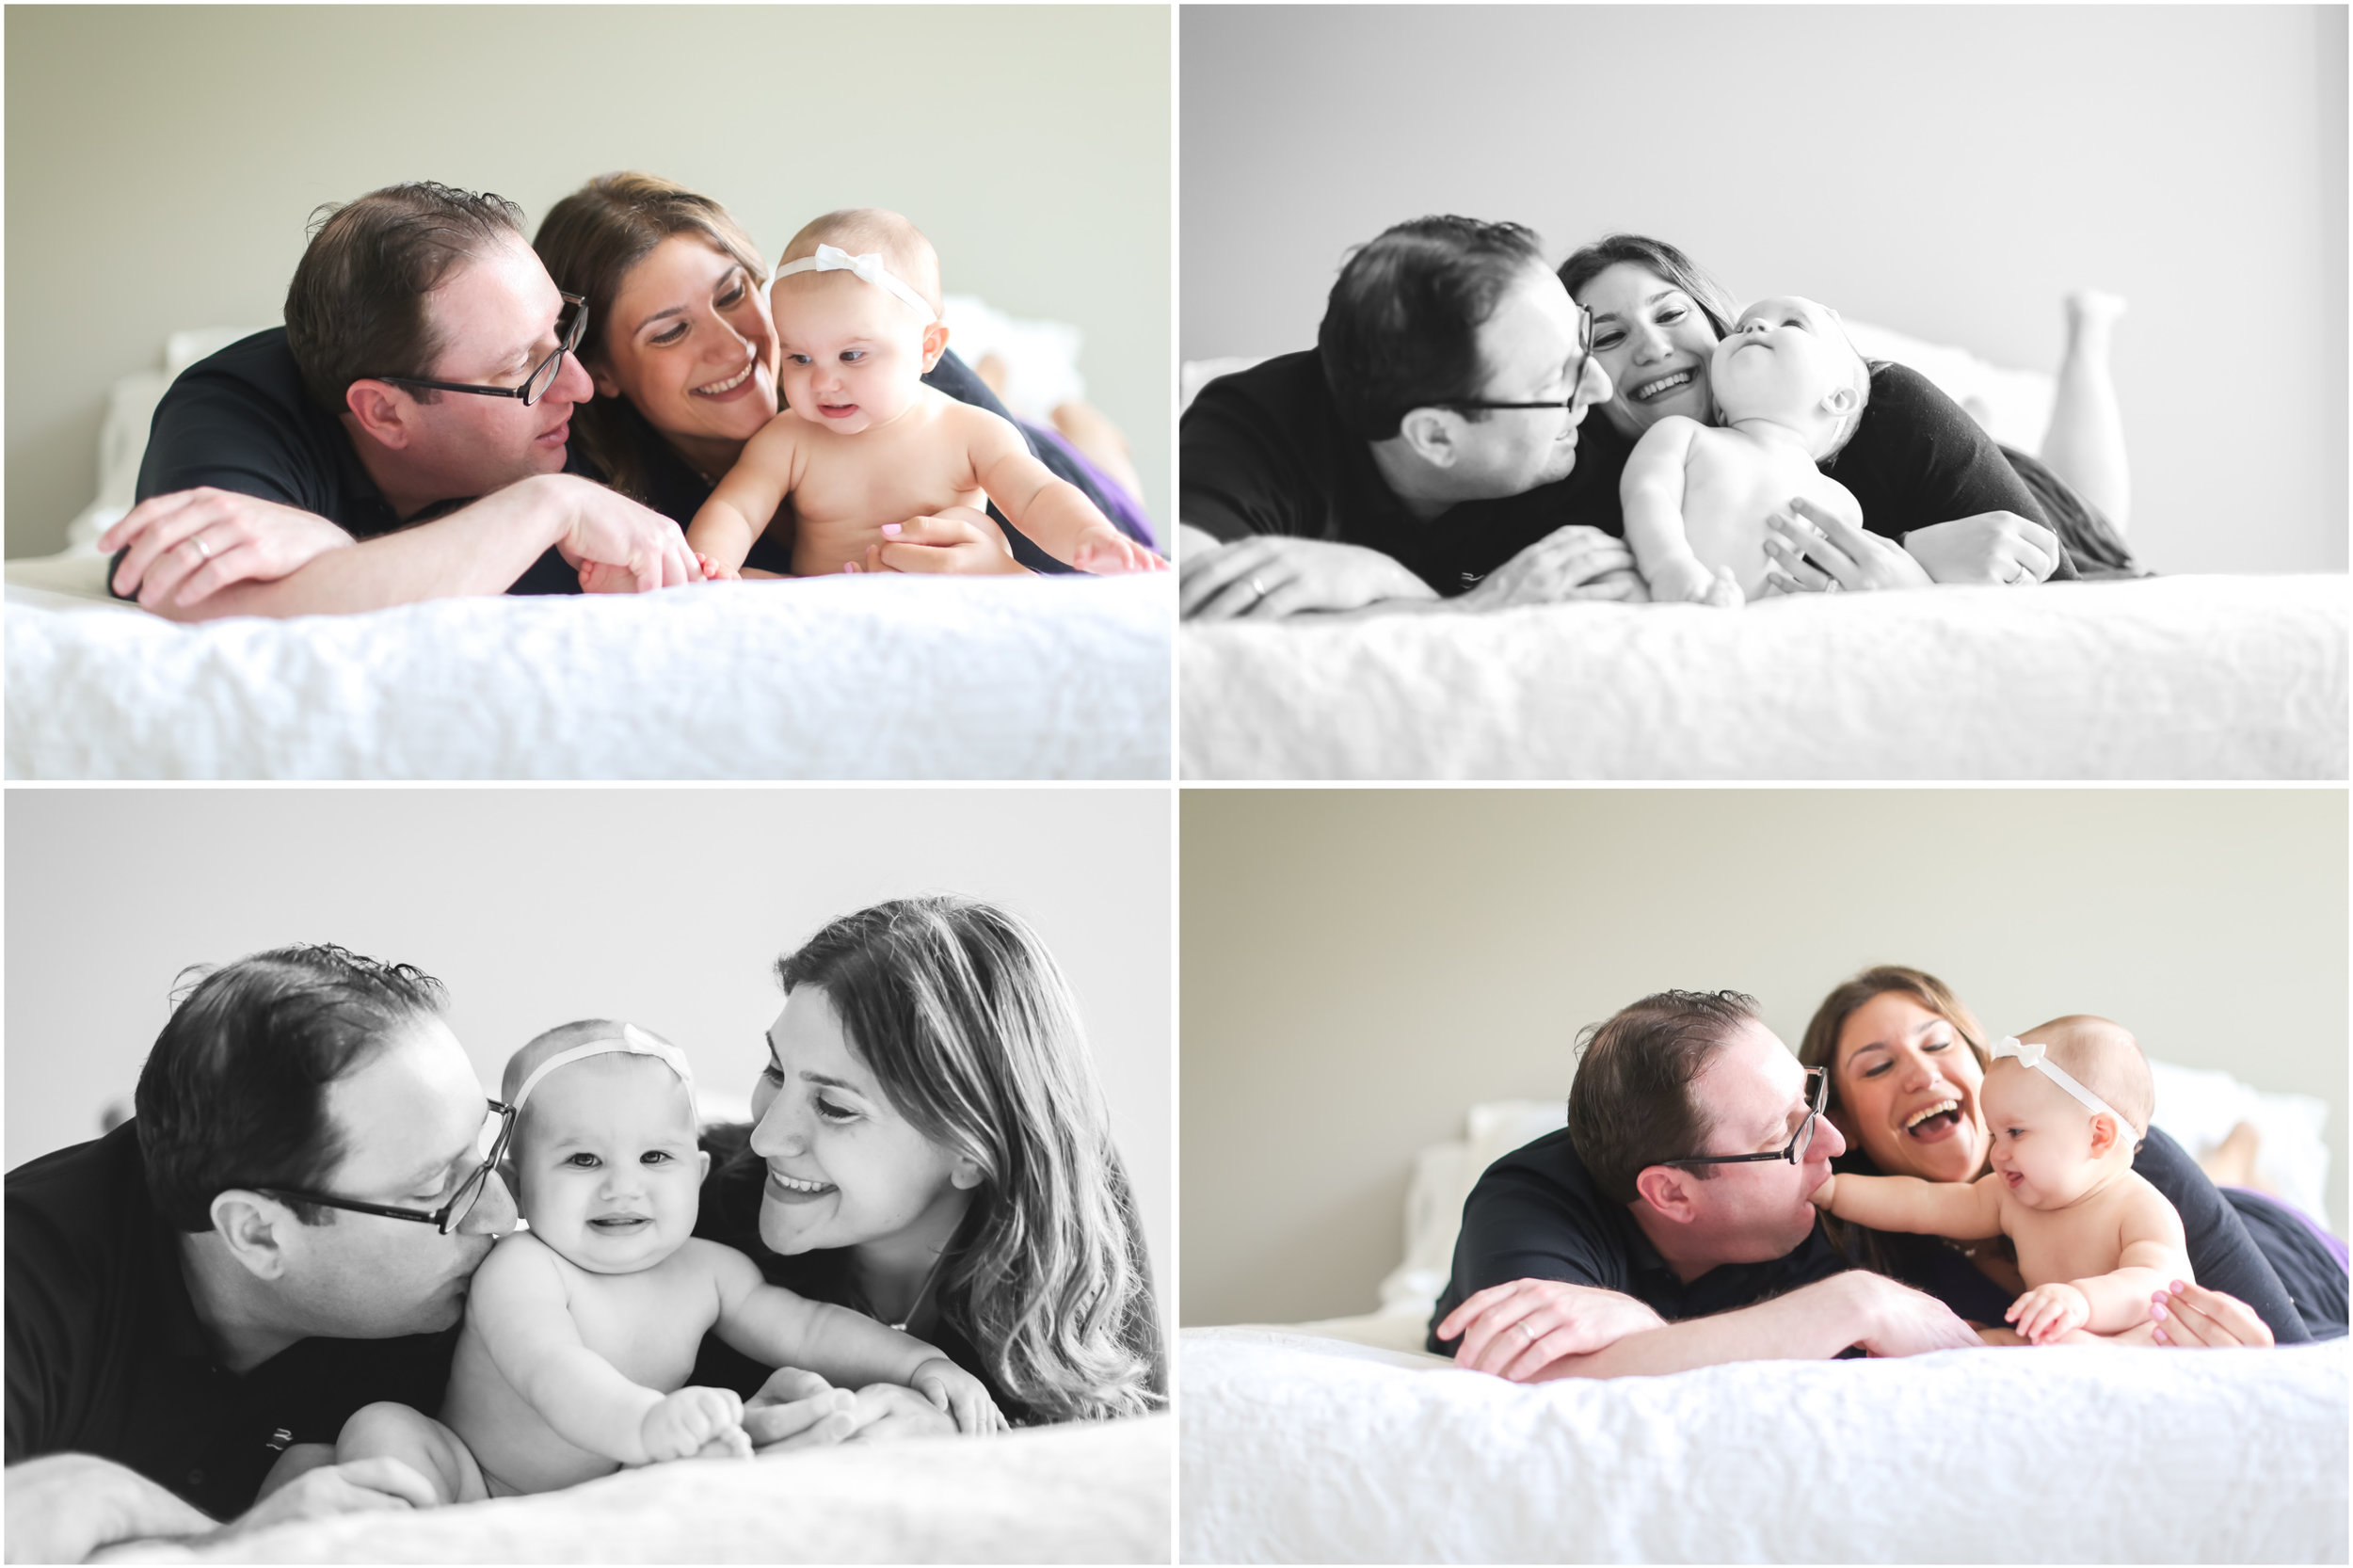 http://jennygrimm.com/blog/gorgeous-city-pregnancy-glow-chicago-maternity-photographer